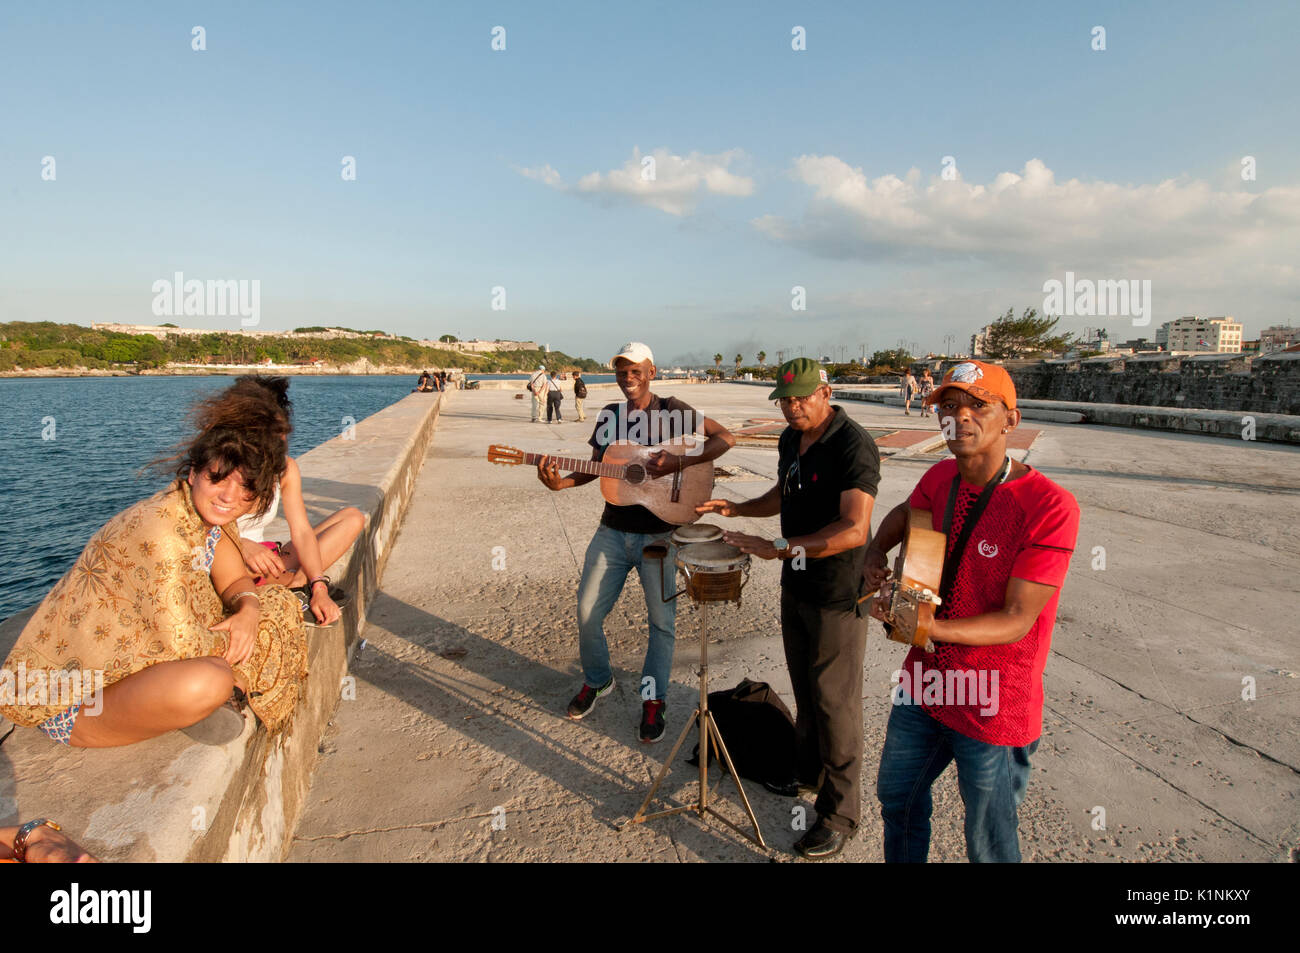 Musiker unterhalten zwei Frauen entlang der Malecon in Havanna, Kuba Stockbild